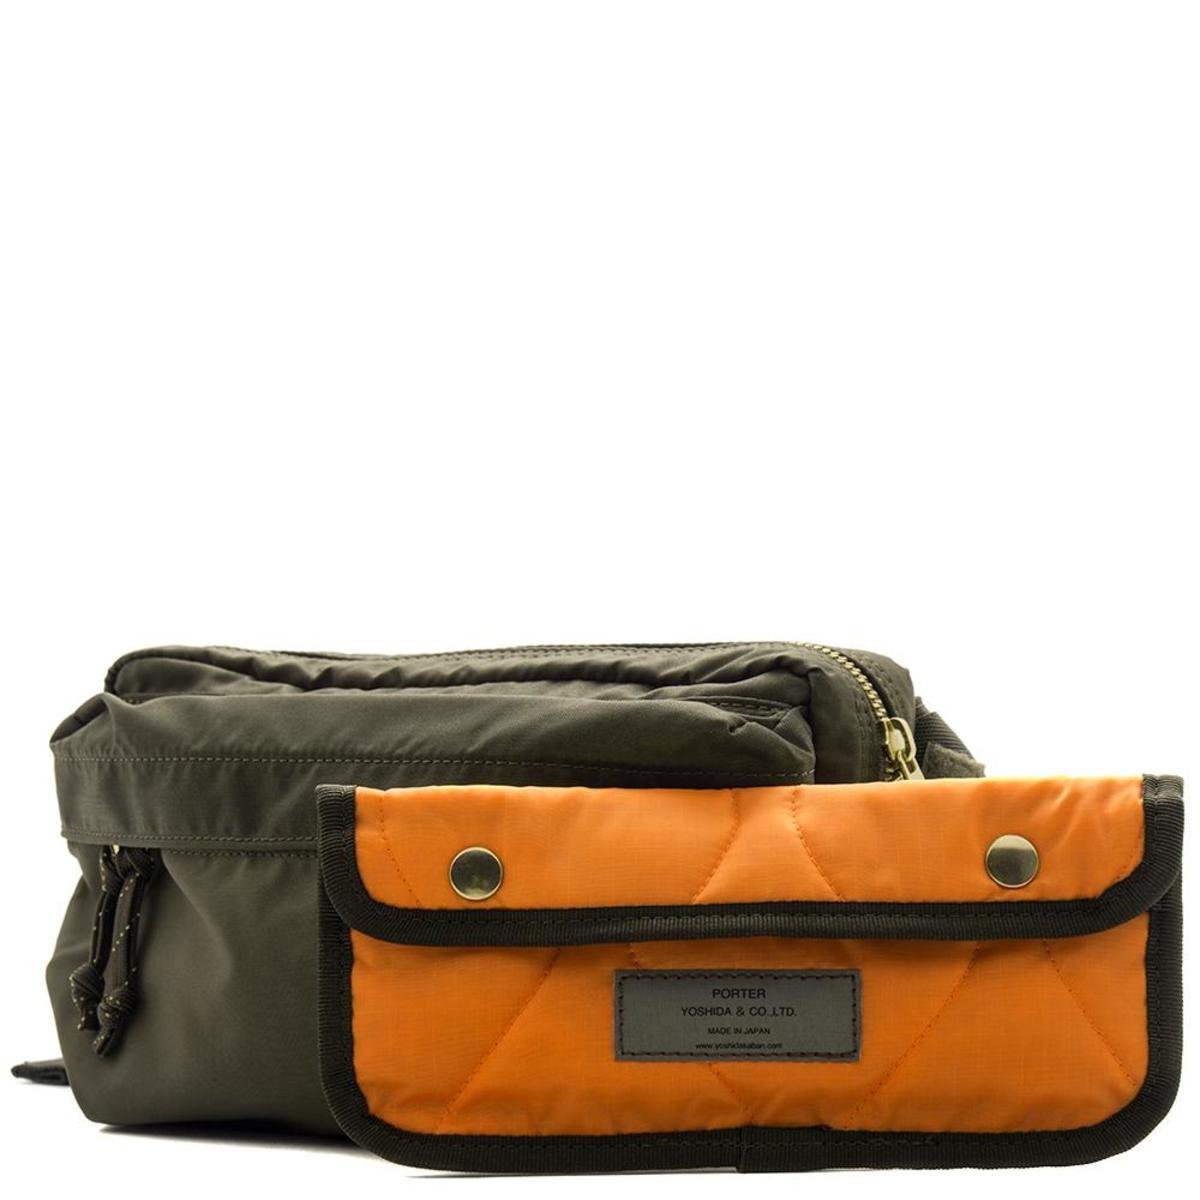 94686becd12 ... Porter Force 2 Way Waist Bag - Olive Garmentory super popular fbd0d  7f5d5 ...